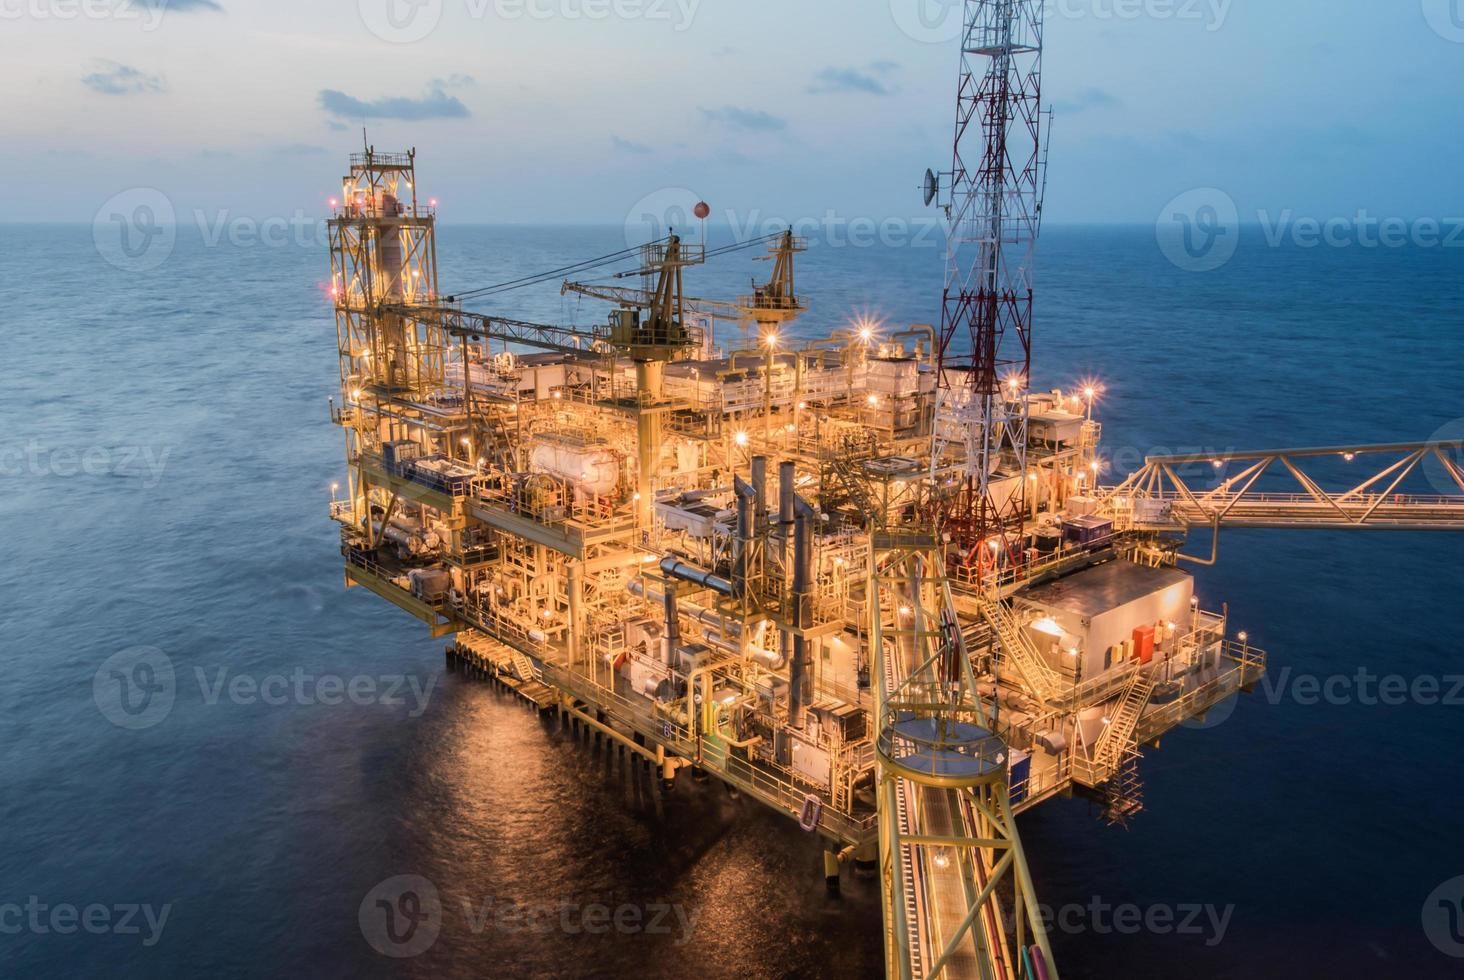 oljeproduktionsplattform på havet foto